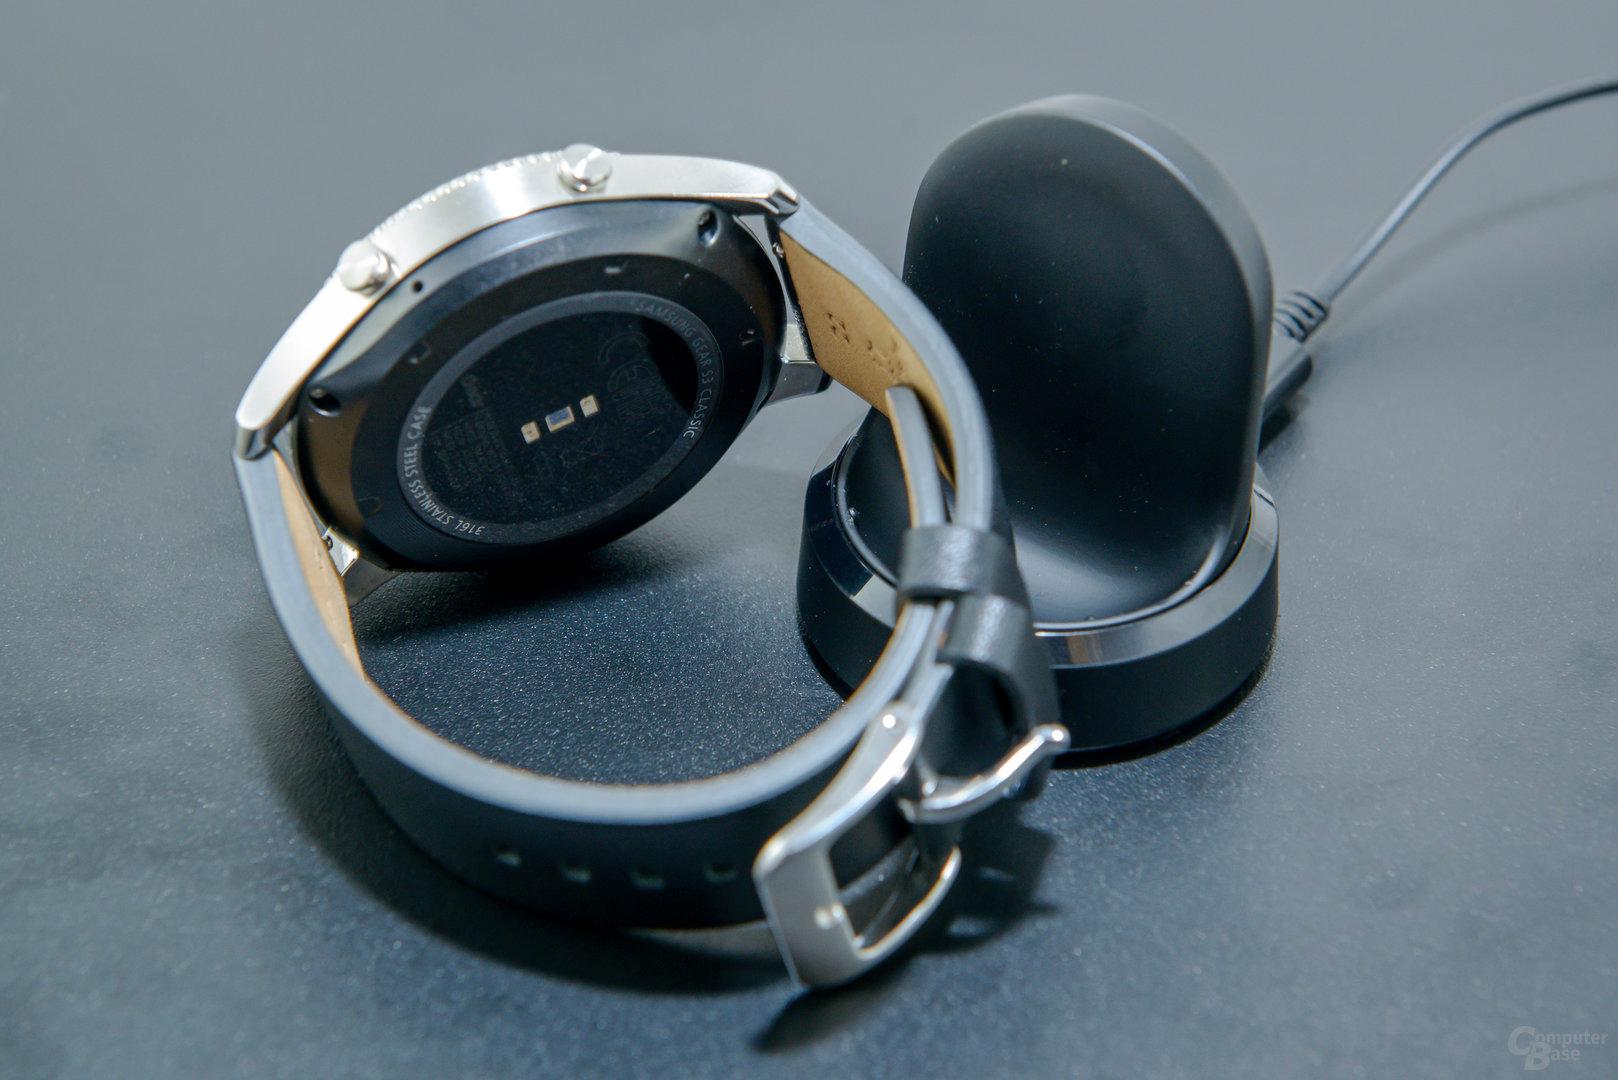 Samsung Gear S3 classic: Ladekonzept